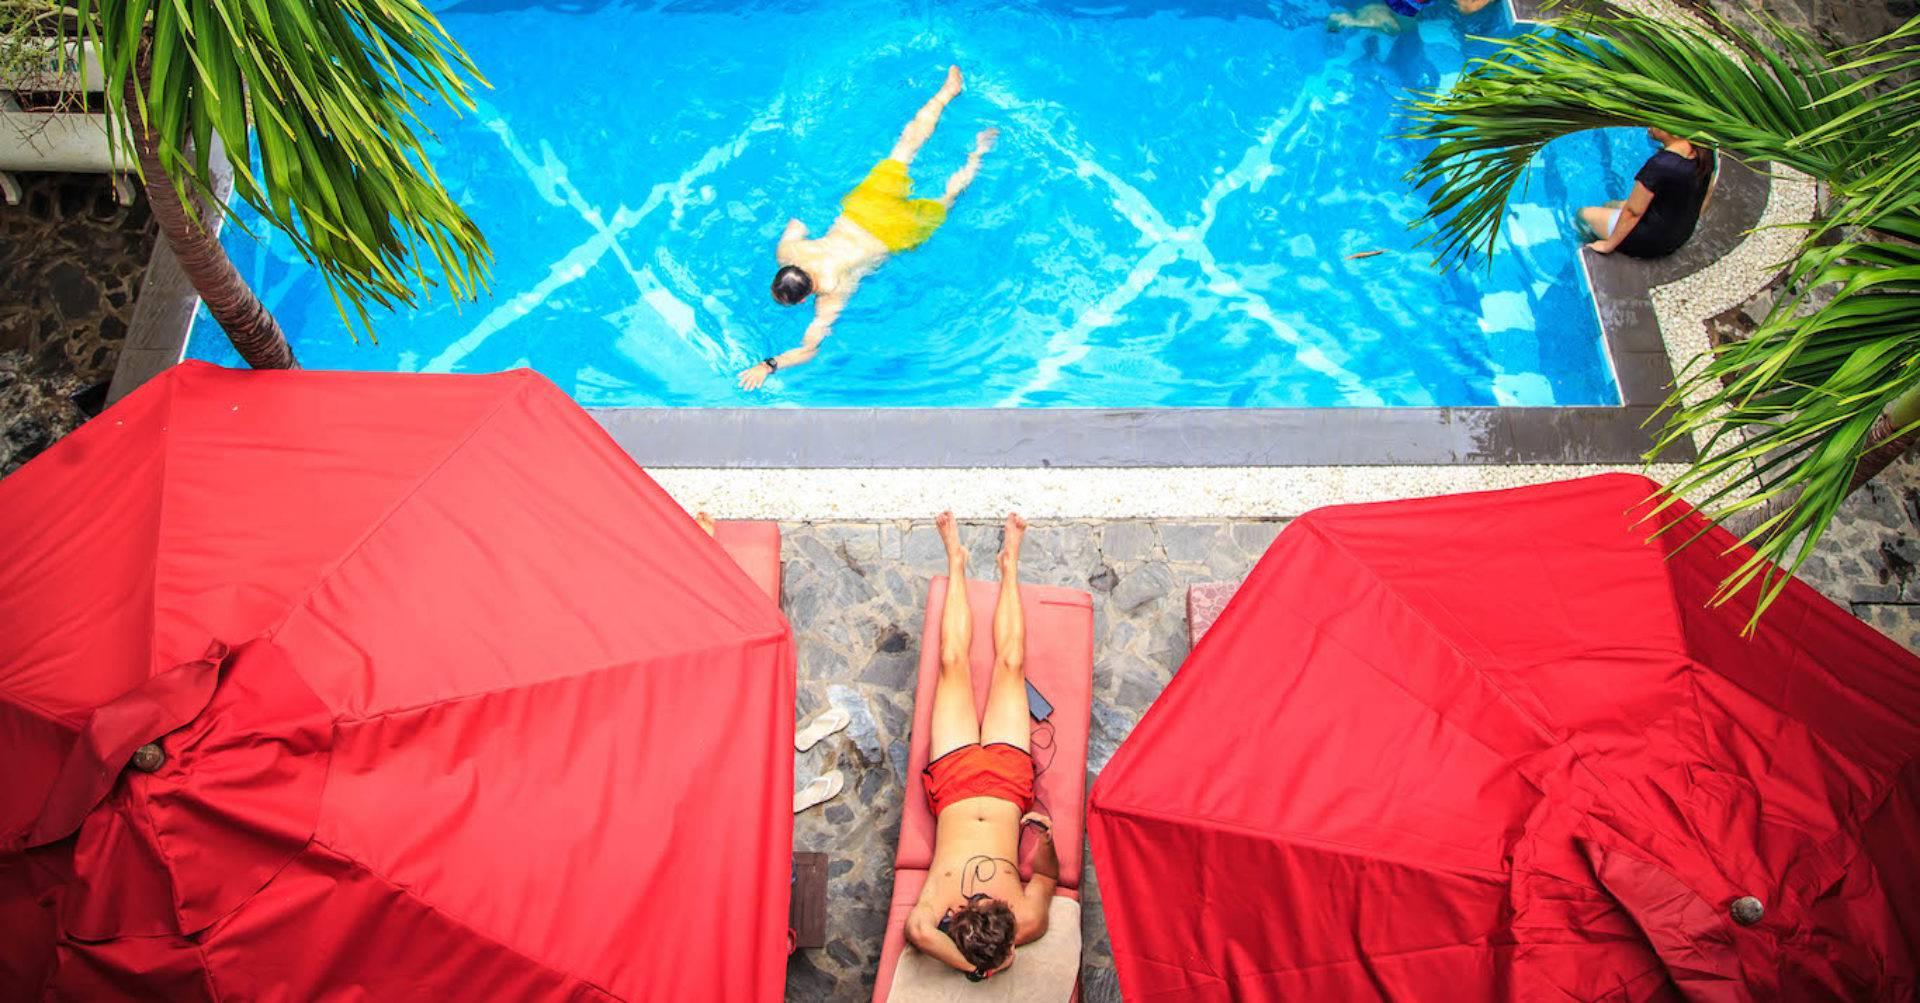 Mui Ne hills – The Best Hotel and Hostel Group in Mui Ne